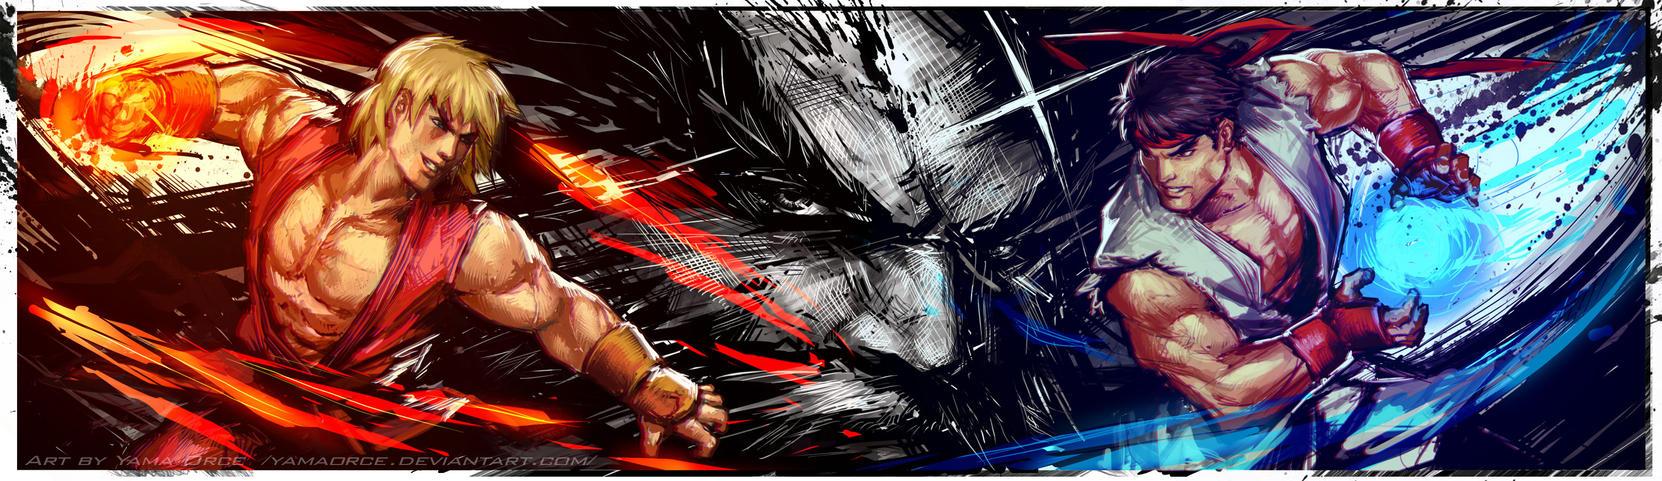 ultra street fighter 4 ryu-kenyamaorce on deviantart